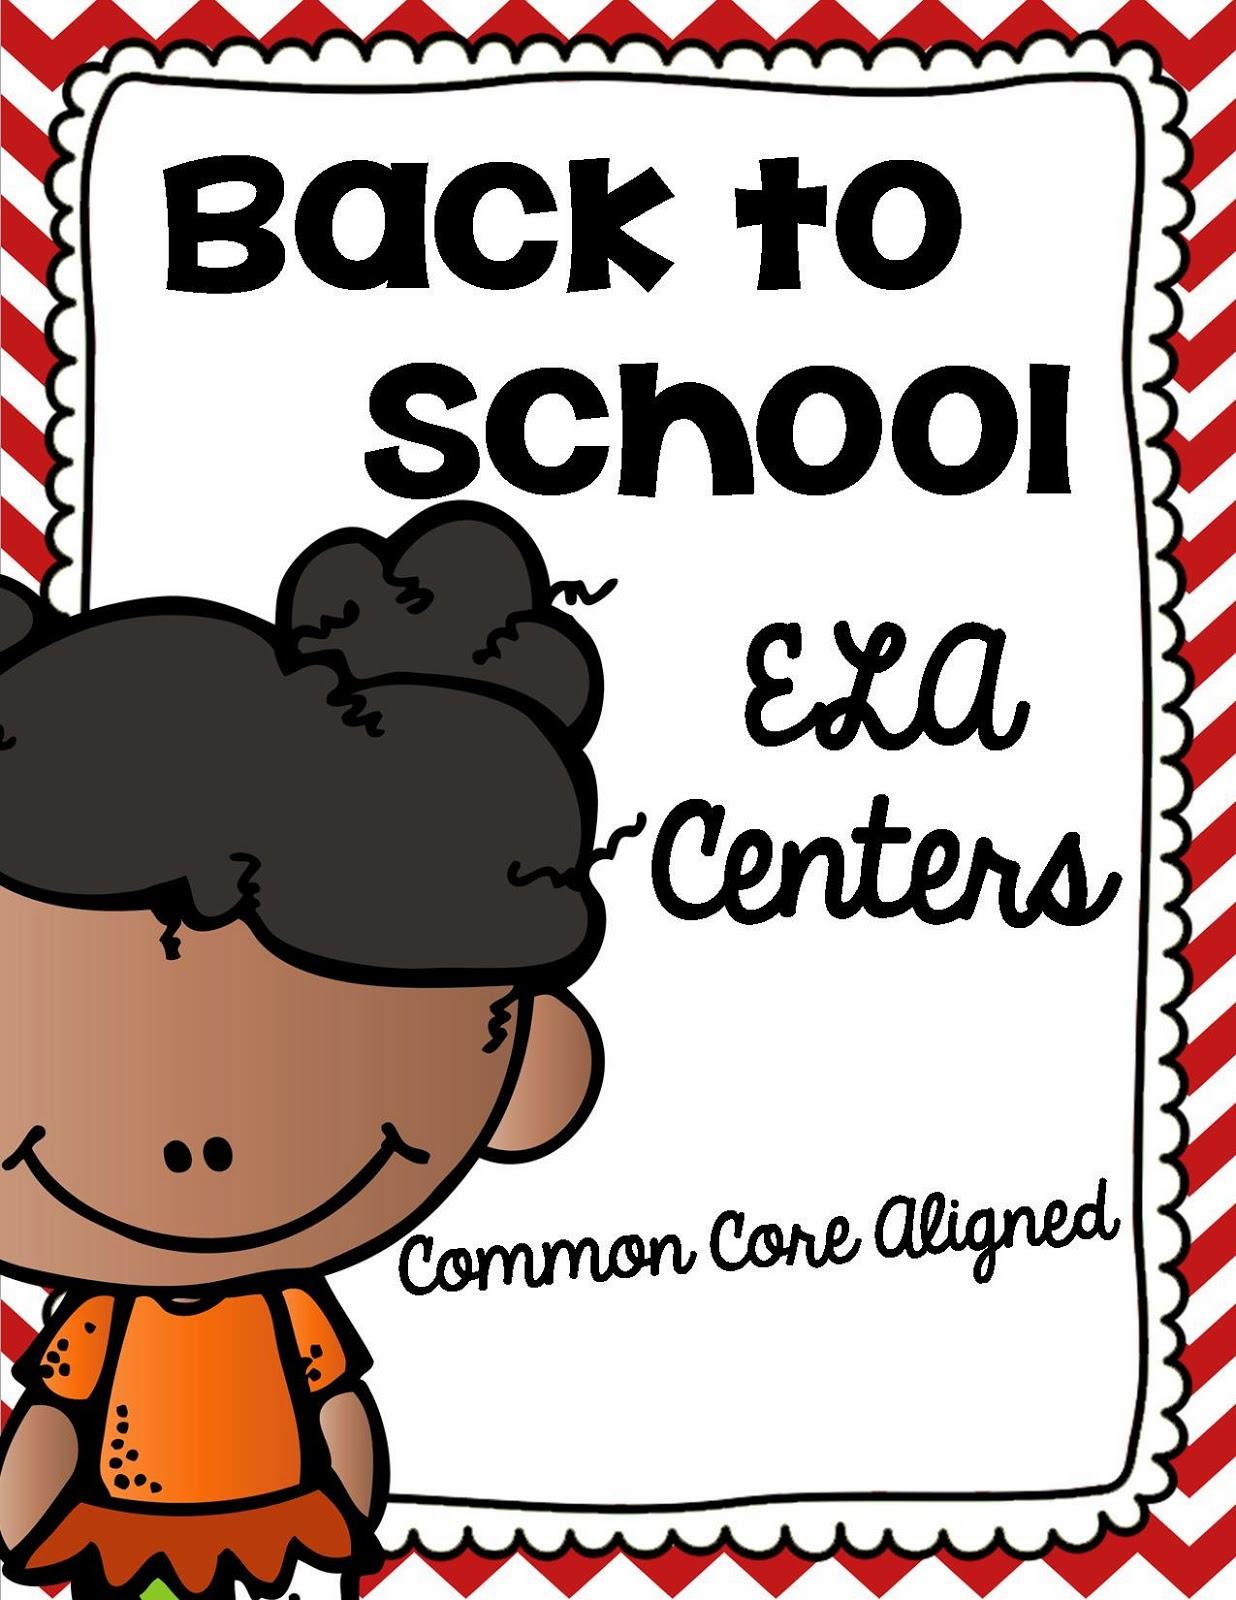 http://www.teacherspayteachers.com/Product/Common-Core-Back-to-School-Literacy-Centers-283071